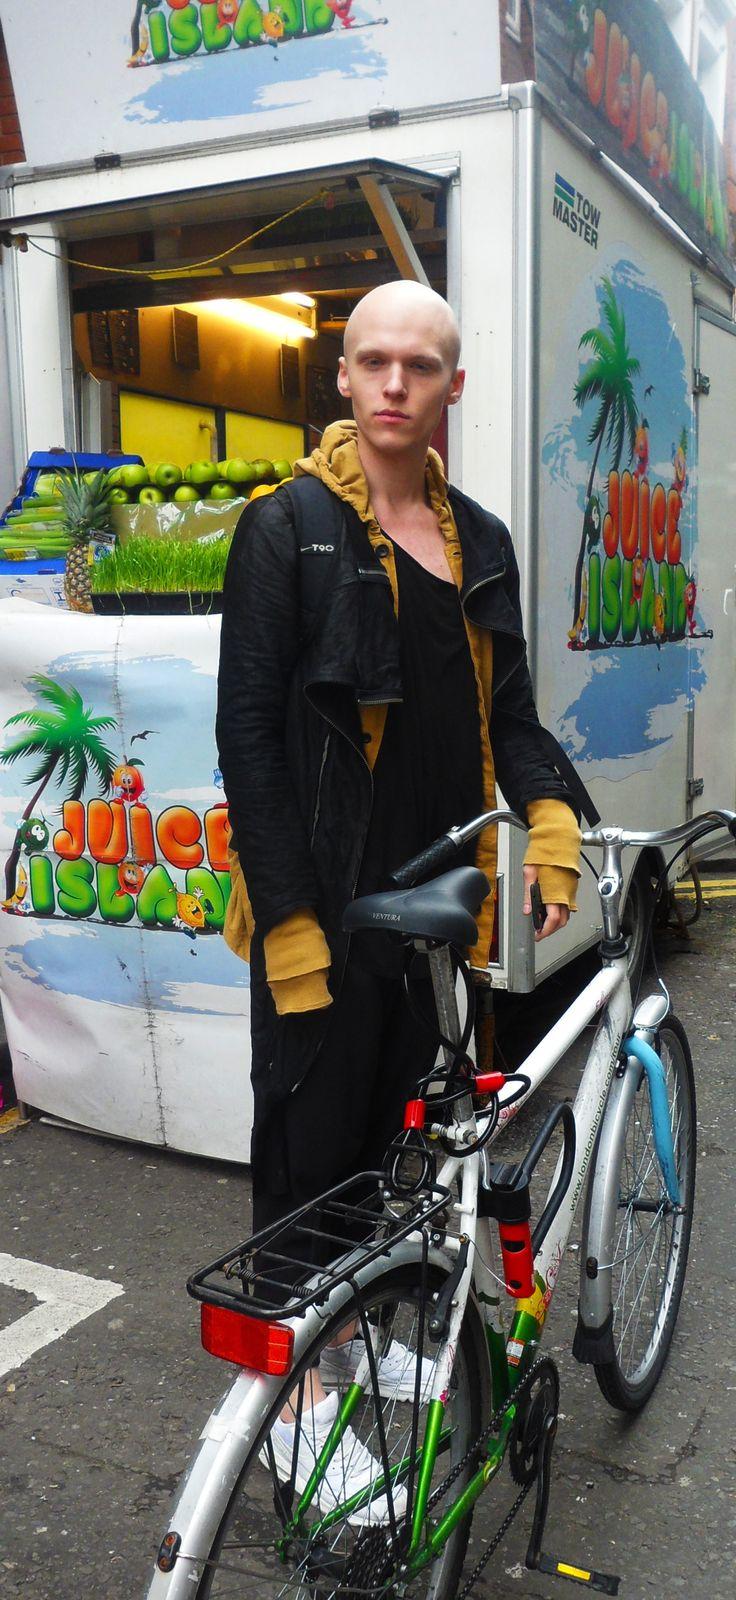 #layers #orange #black #bike #menswear #london #covent